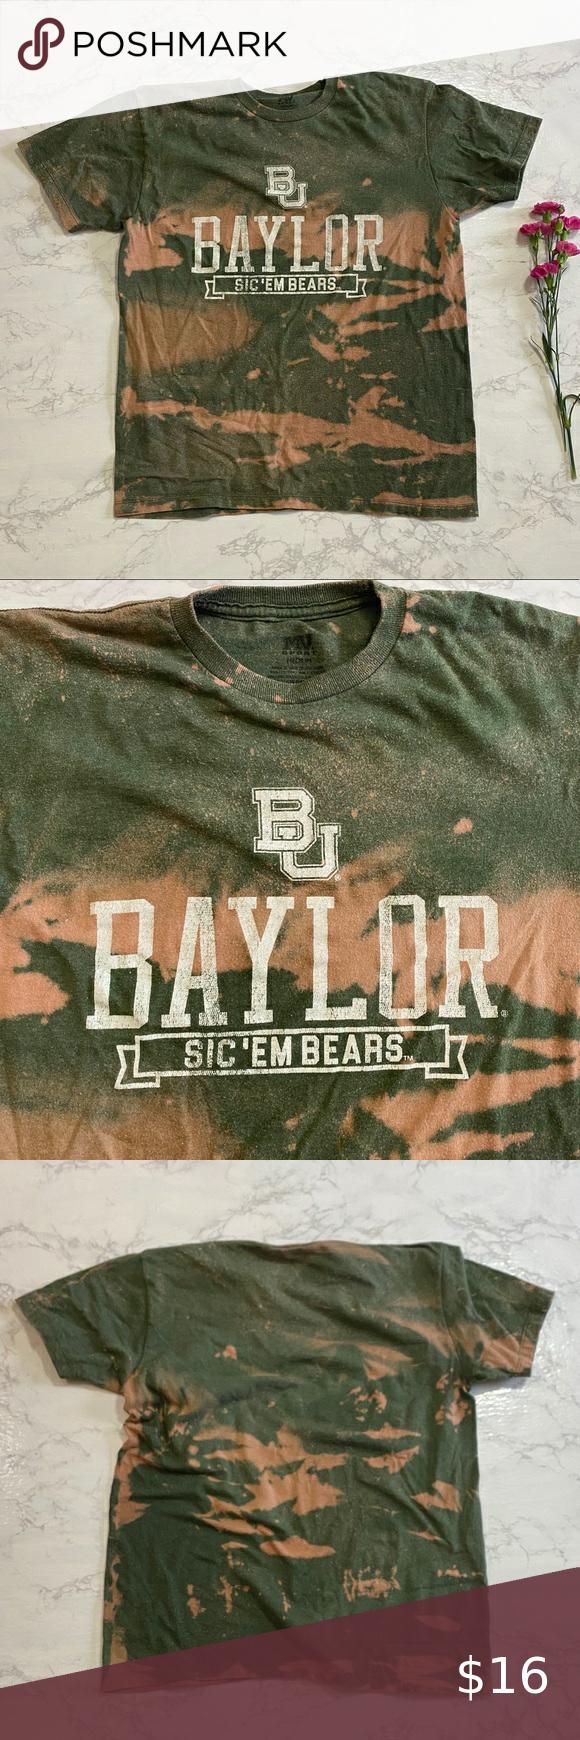 Baylor University Sic Em Bears bleached tee m in 2020